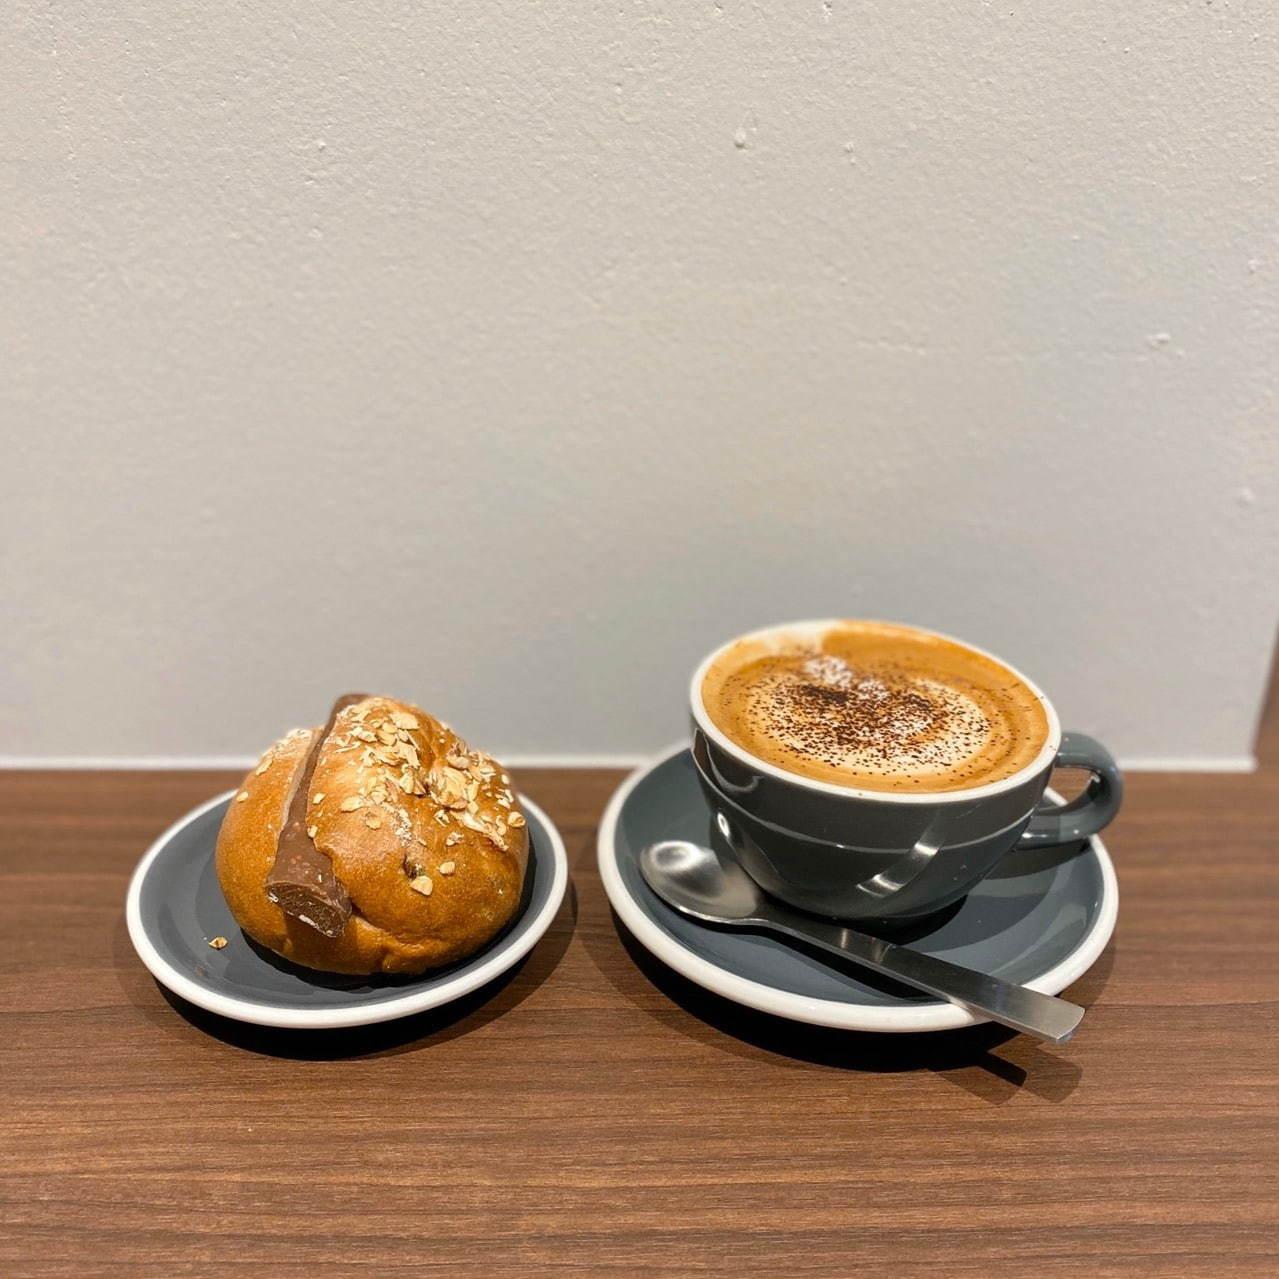 NZ発の本格コーヒーカフェ「オークスコーヒー」大阪に初上陸、現地と ...